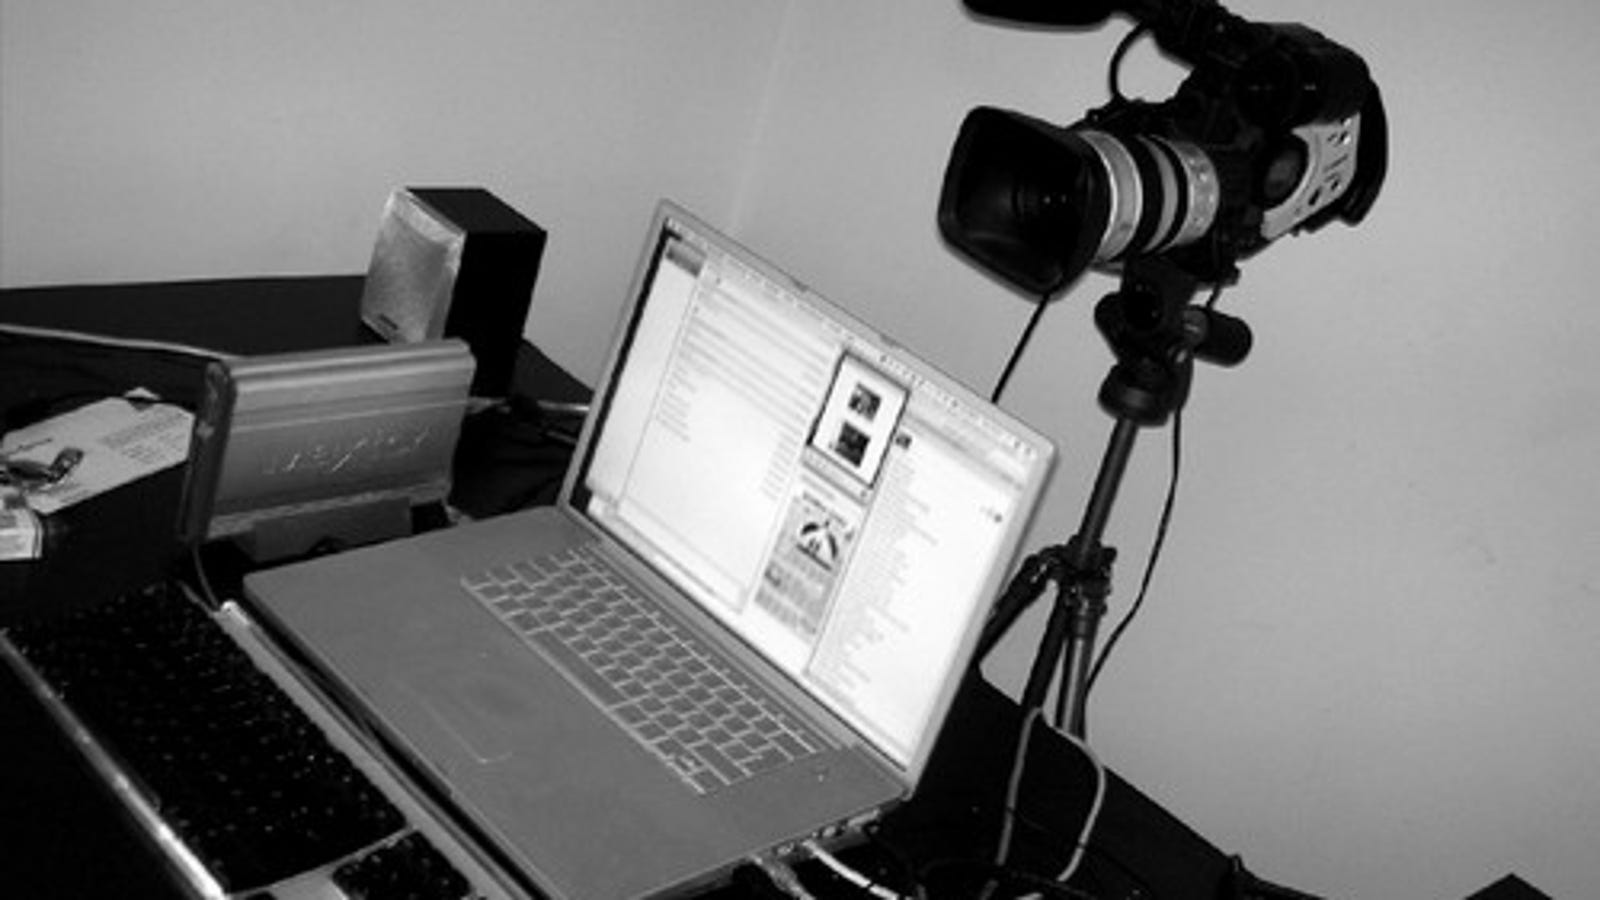 Shemale cumming video galleries